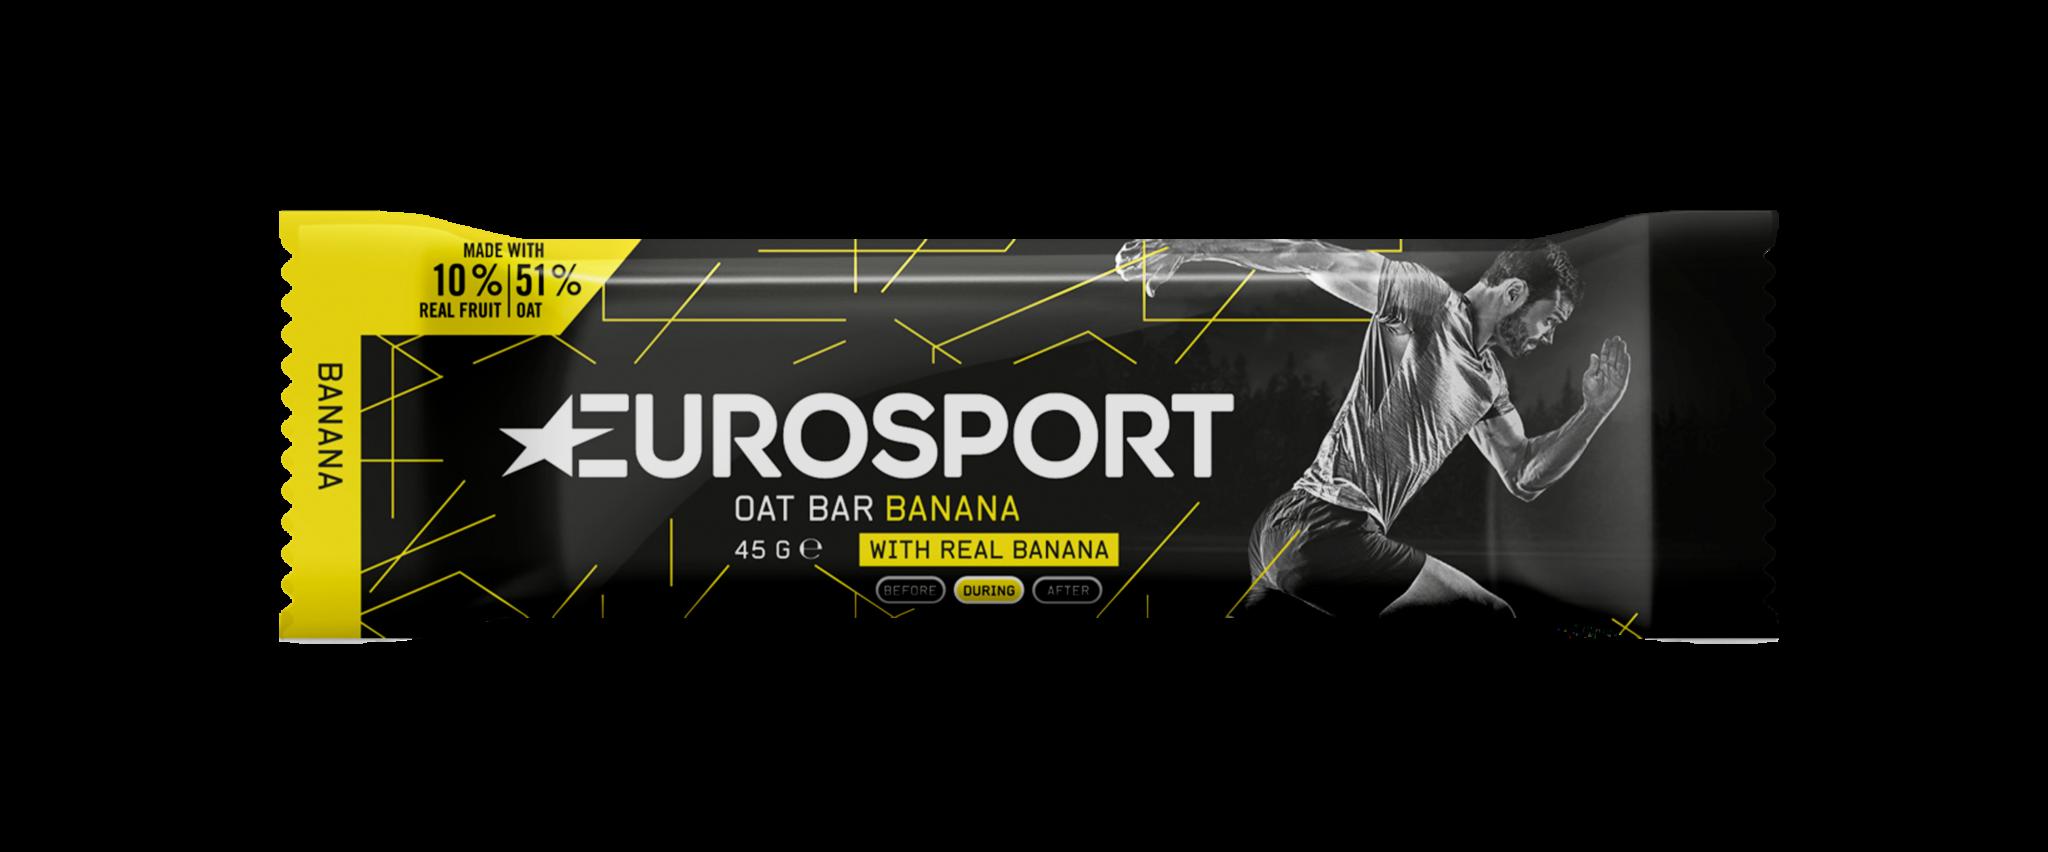 Eurosport - Oat Bar Banana - Reep - 3D